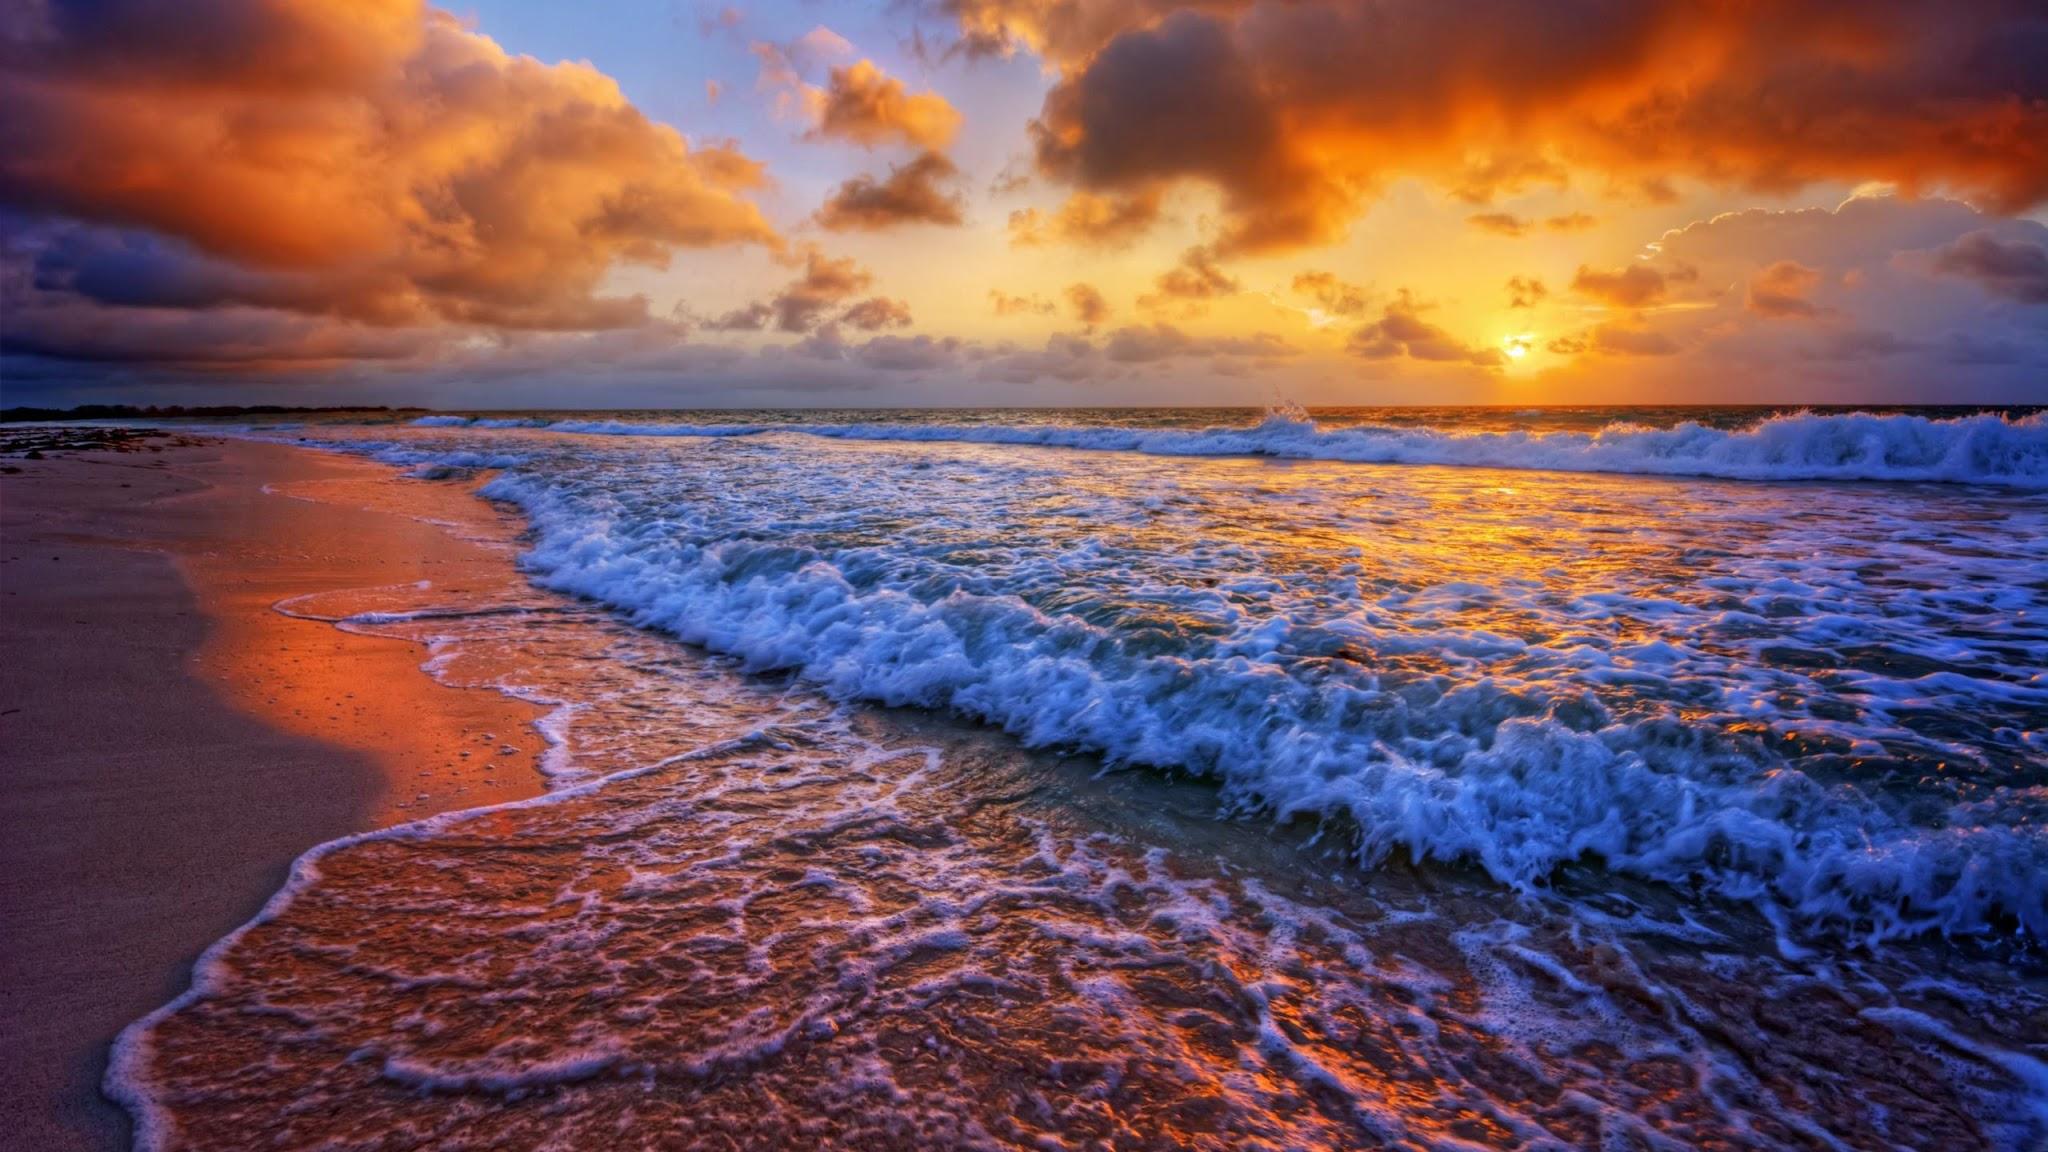 beautiful sea landscape wallpaper - photo #37